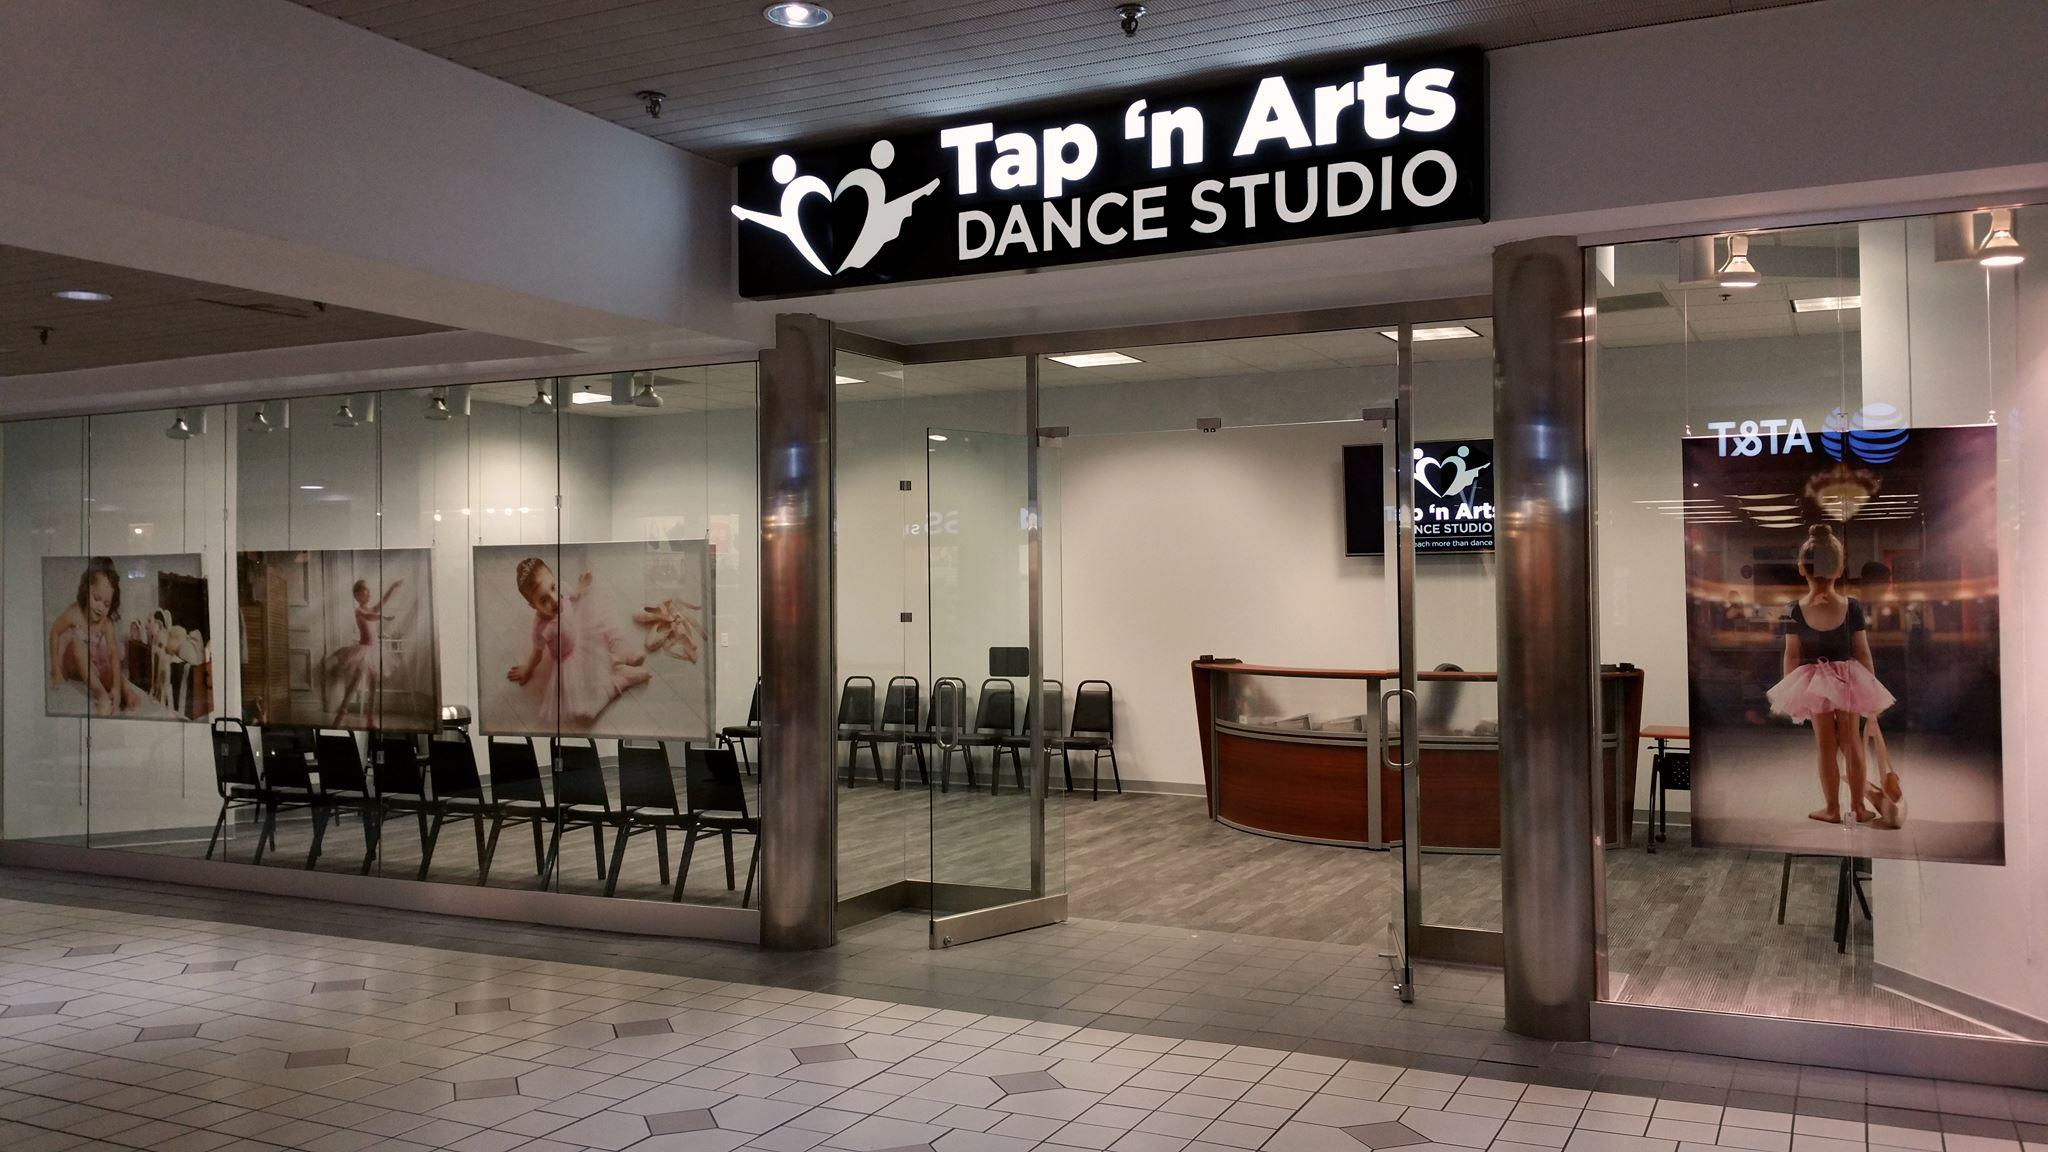 Tap 'n Arts Dance Studio of Harrisburg, PA image 2